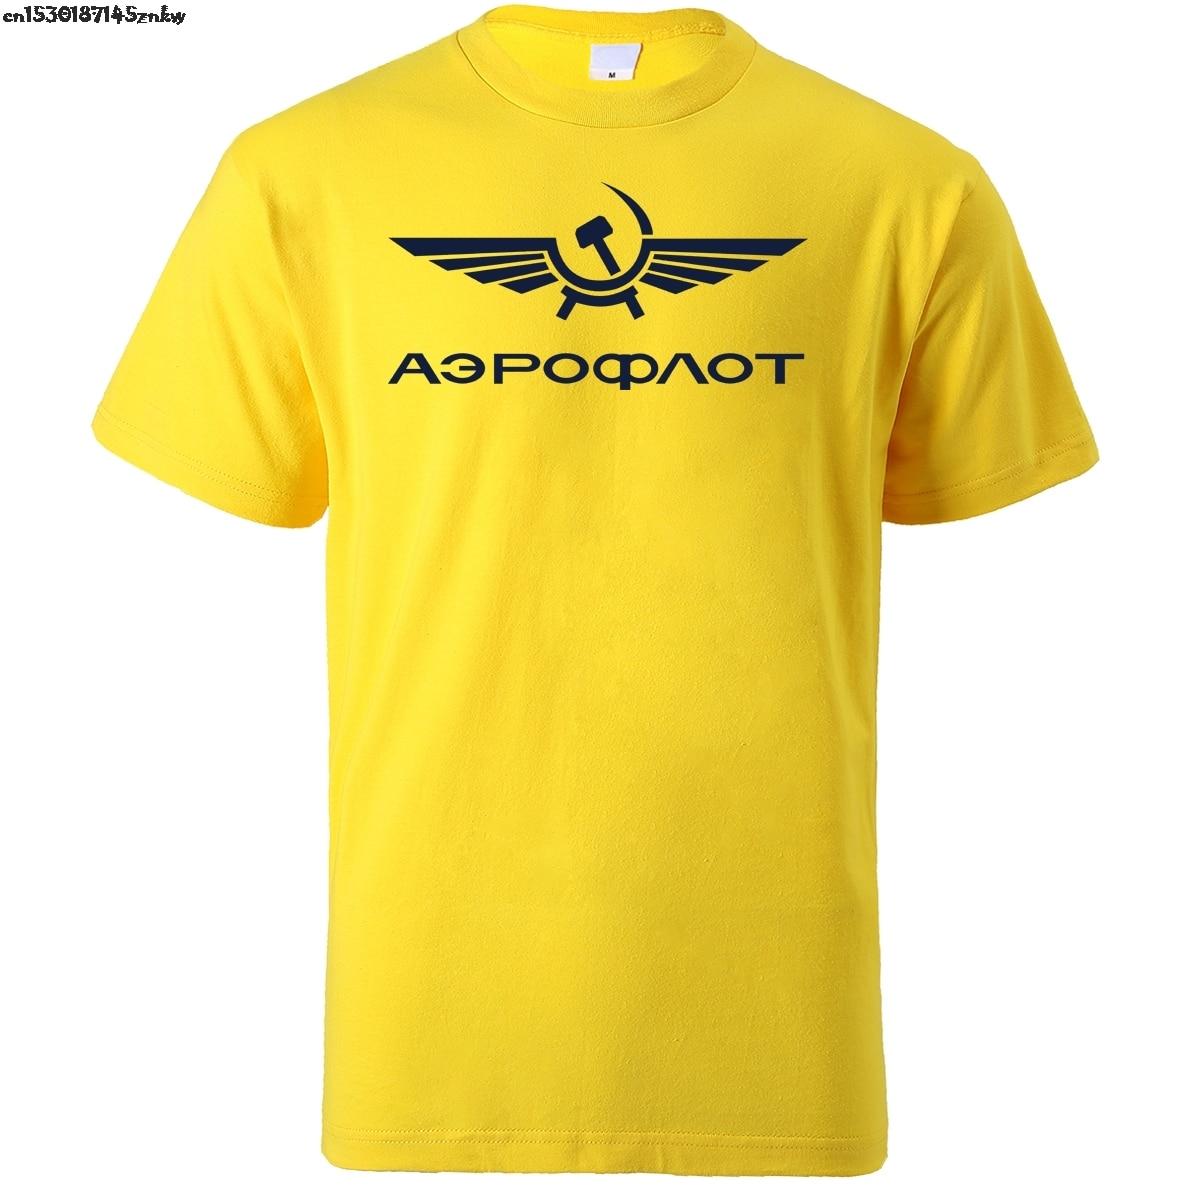 Camiseta Aeroflot CCCP para hombres, ropa de calle de la Fuerza Aérea de Rusia Ussr de aviación Civil, camisetas para hombre de verano 2020, camisetas de algodón Hip Hop P